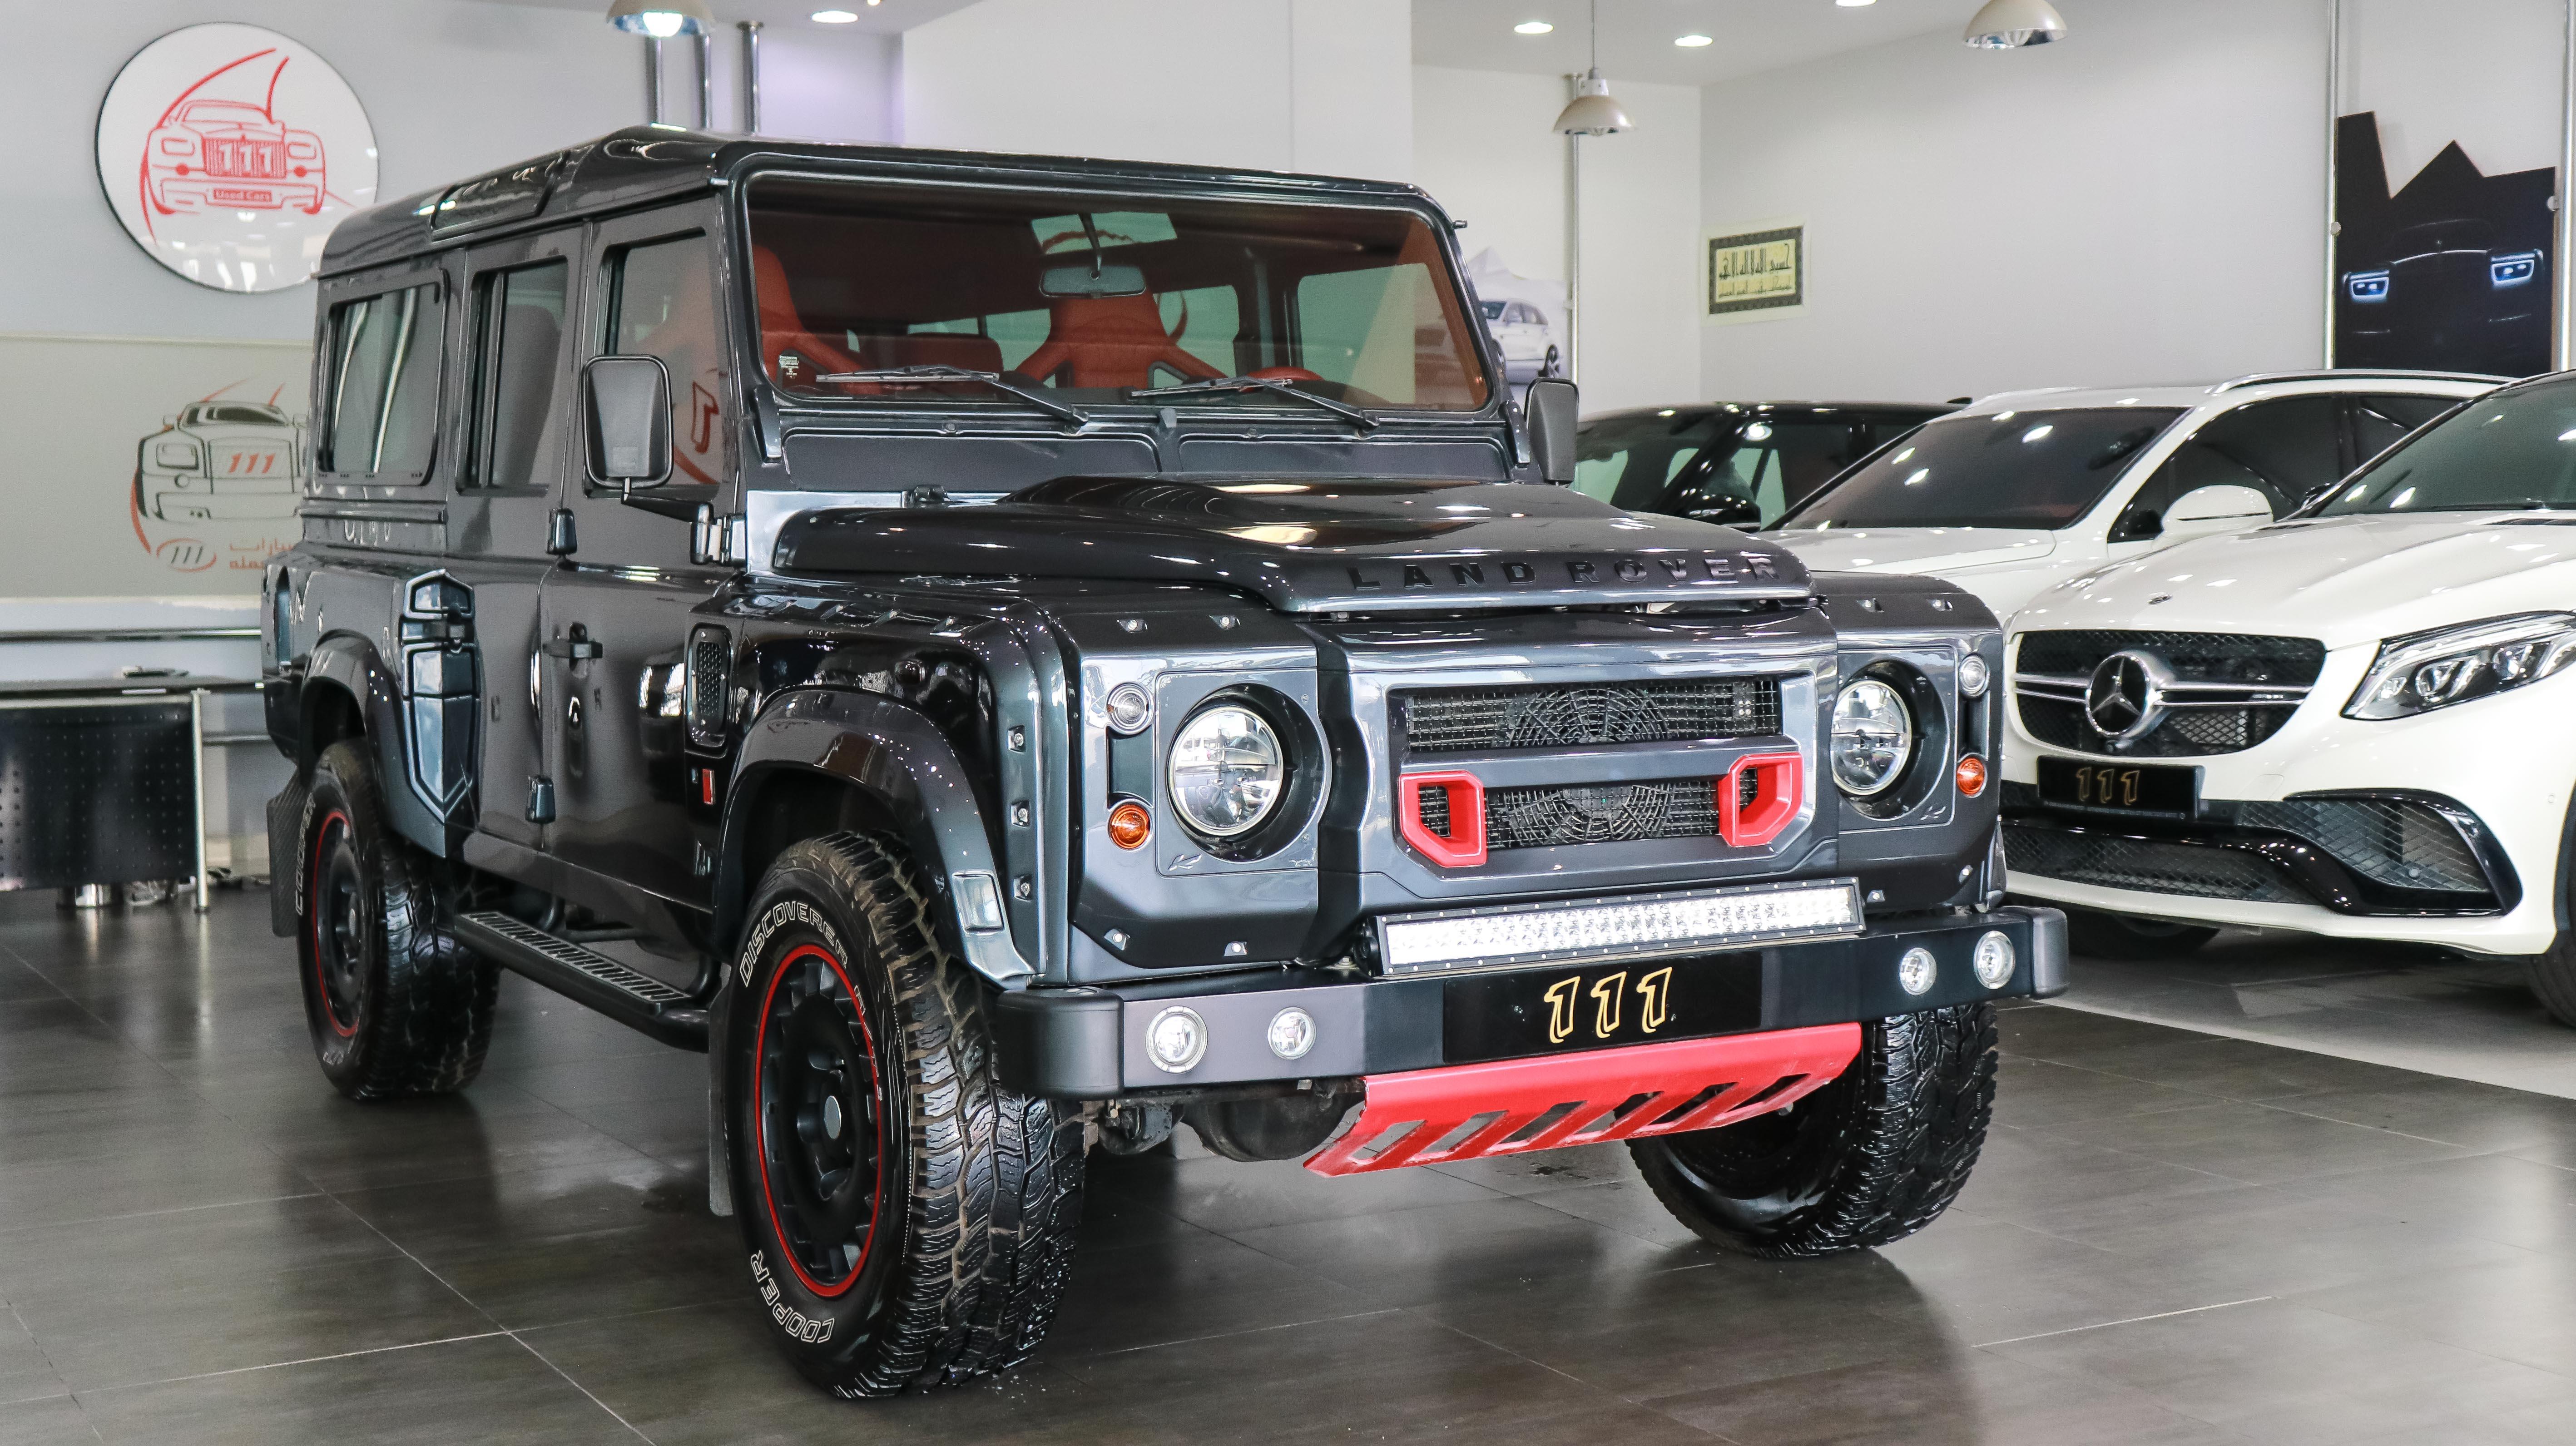 2014-Land-Rover-Defender-Kahn-Body-Kit-Grey-Red-GCC-03-Copy-Copy.jpg